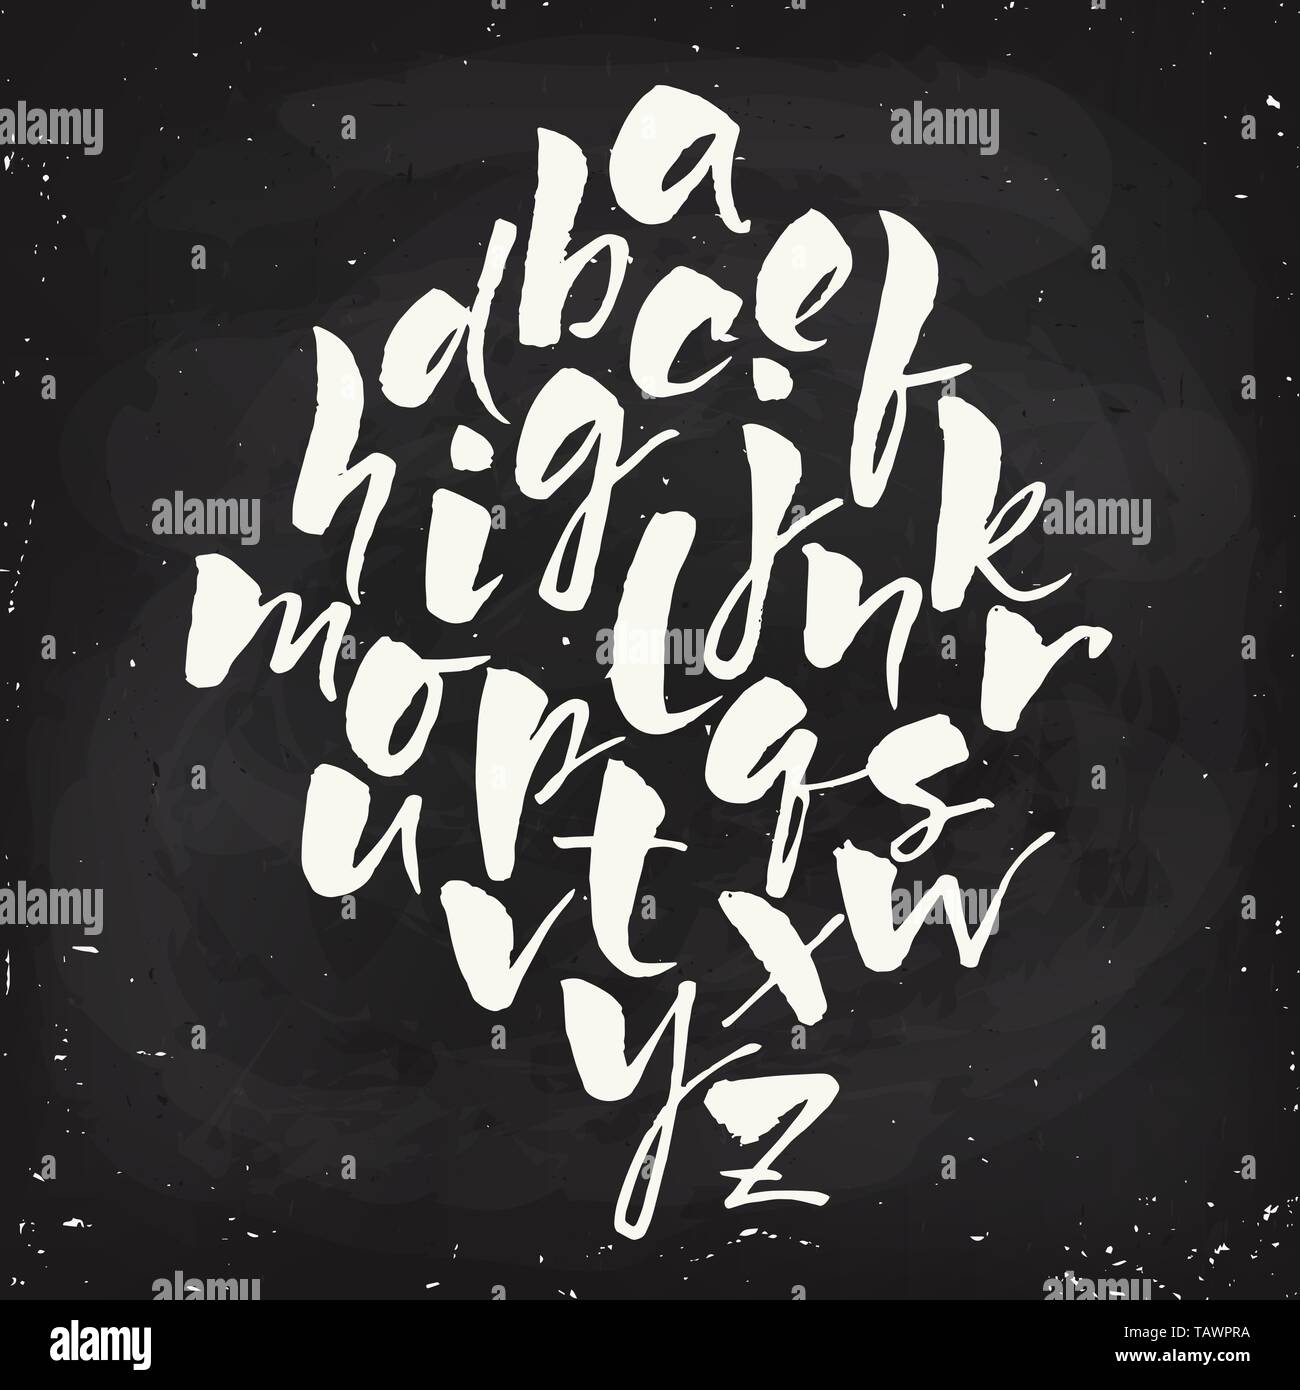 Vector modern calligraphic hand written alphabet set - Stock Image